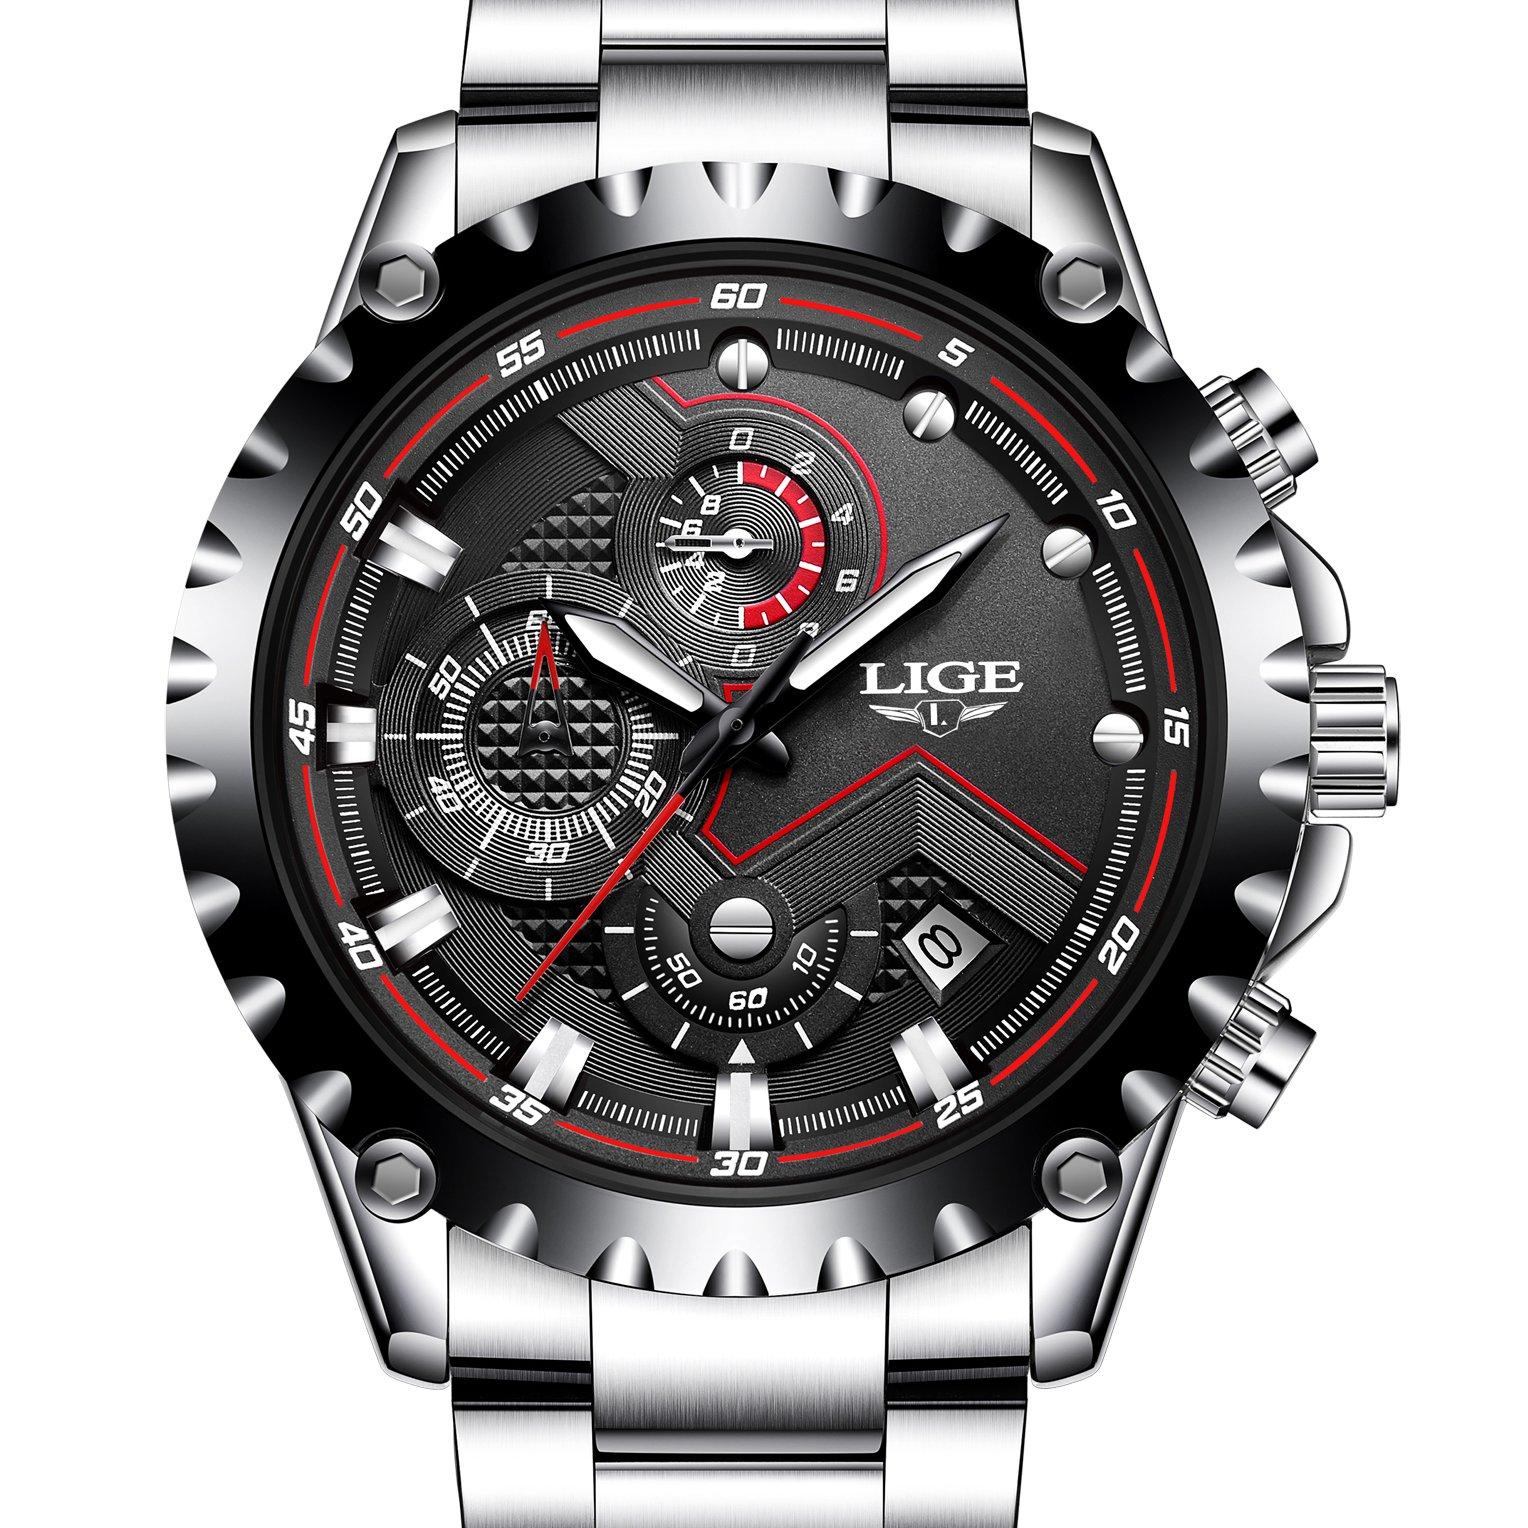 Mens Sport Fashion Chronograph Analog Quartz Wrist Watches Date Stainless Steel Band,Silver Black